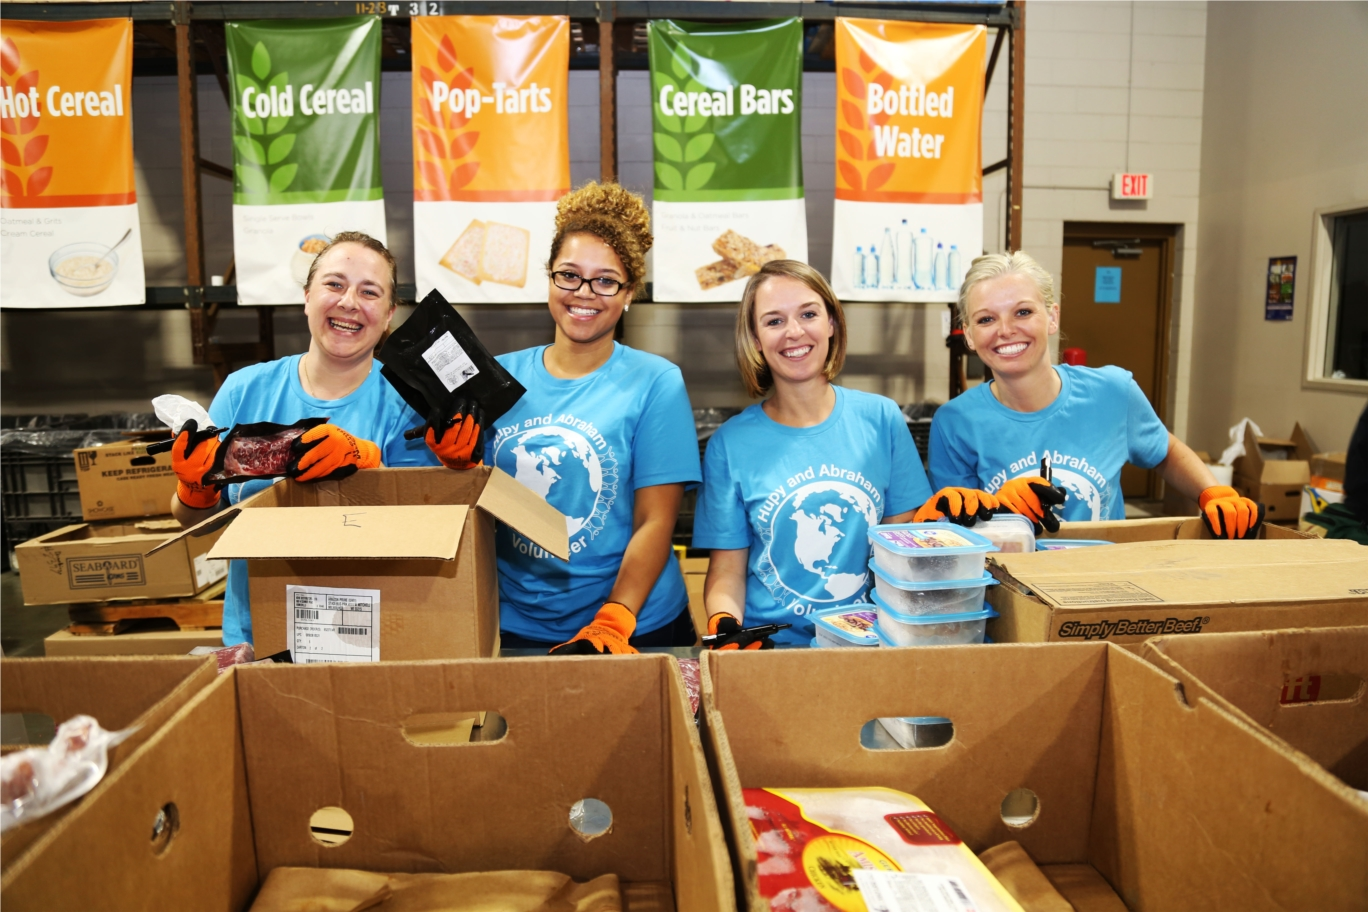 Hupy and Abraham Feeding America Volunteer Group